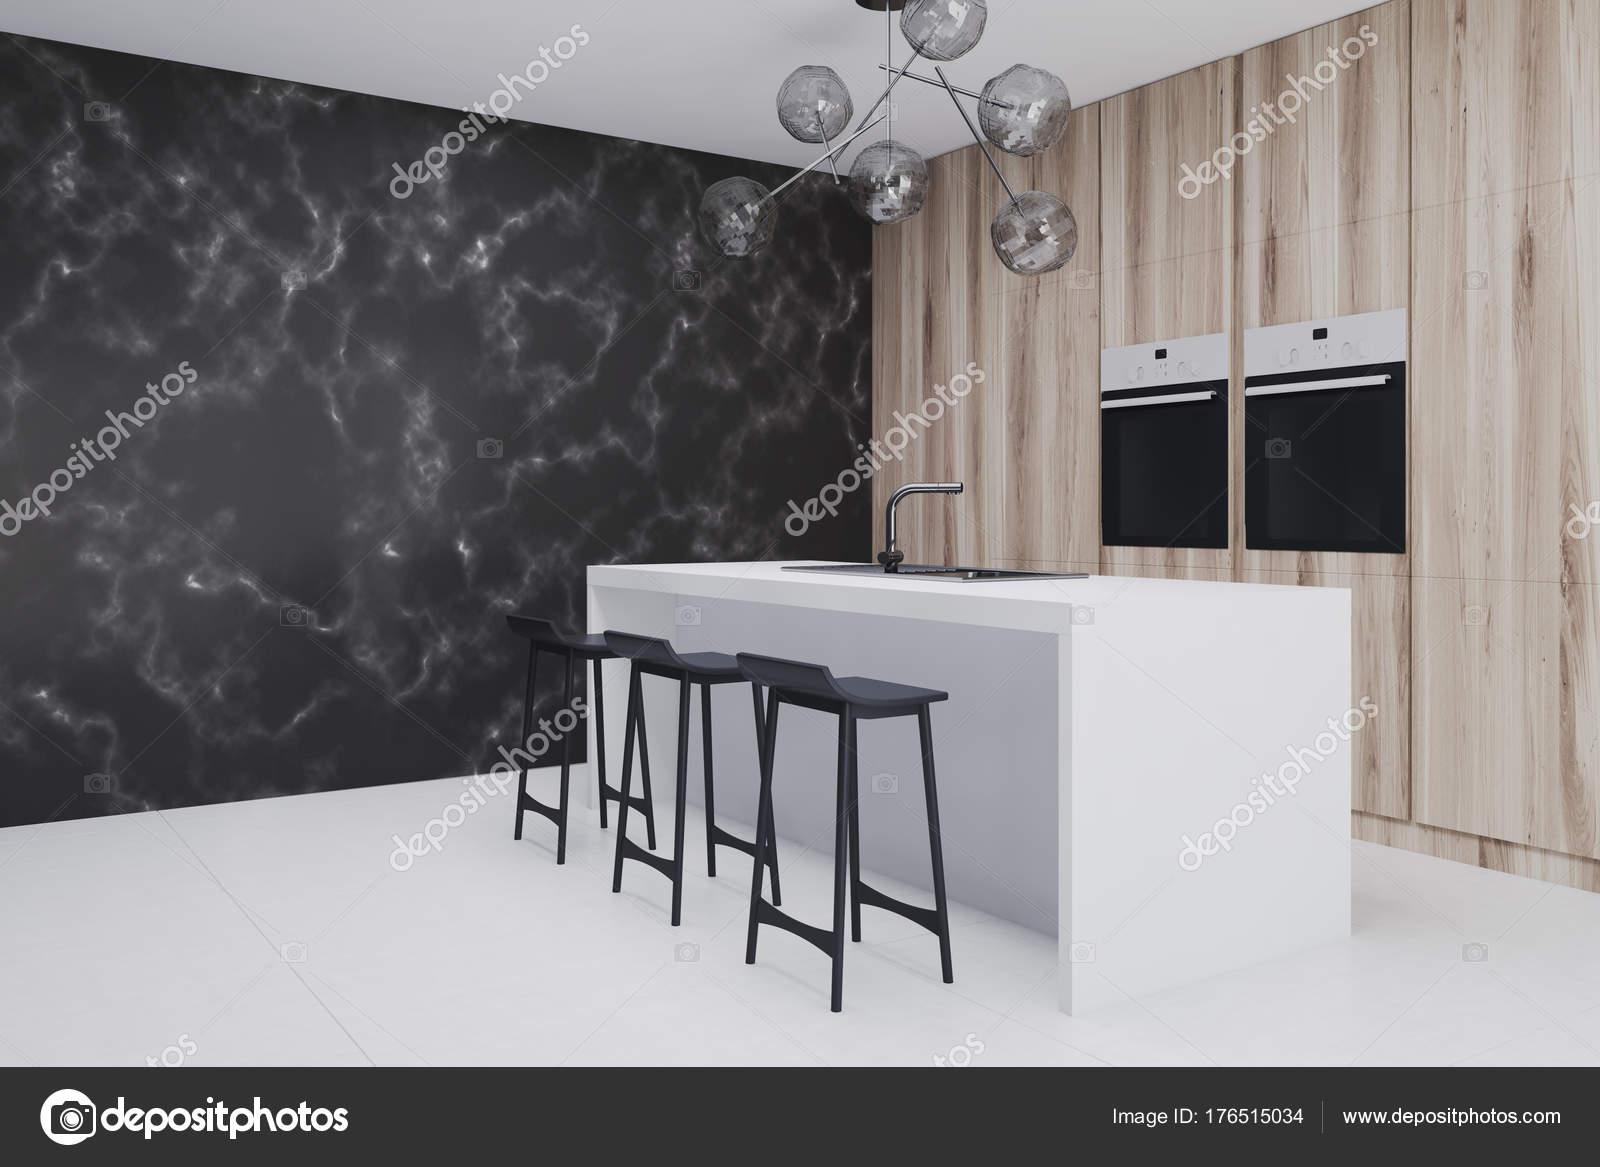 Keuken Marmer Zwart : Houten keuken met bar kant zwart marmeren closeup u2014 stockfoto